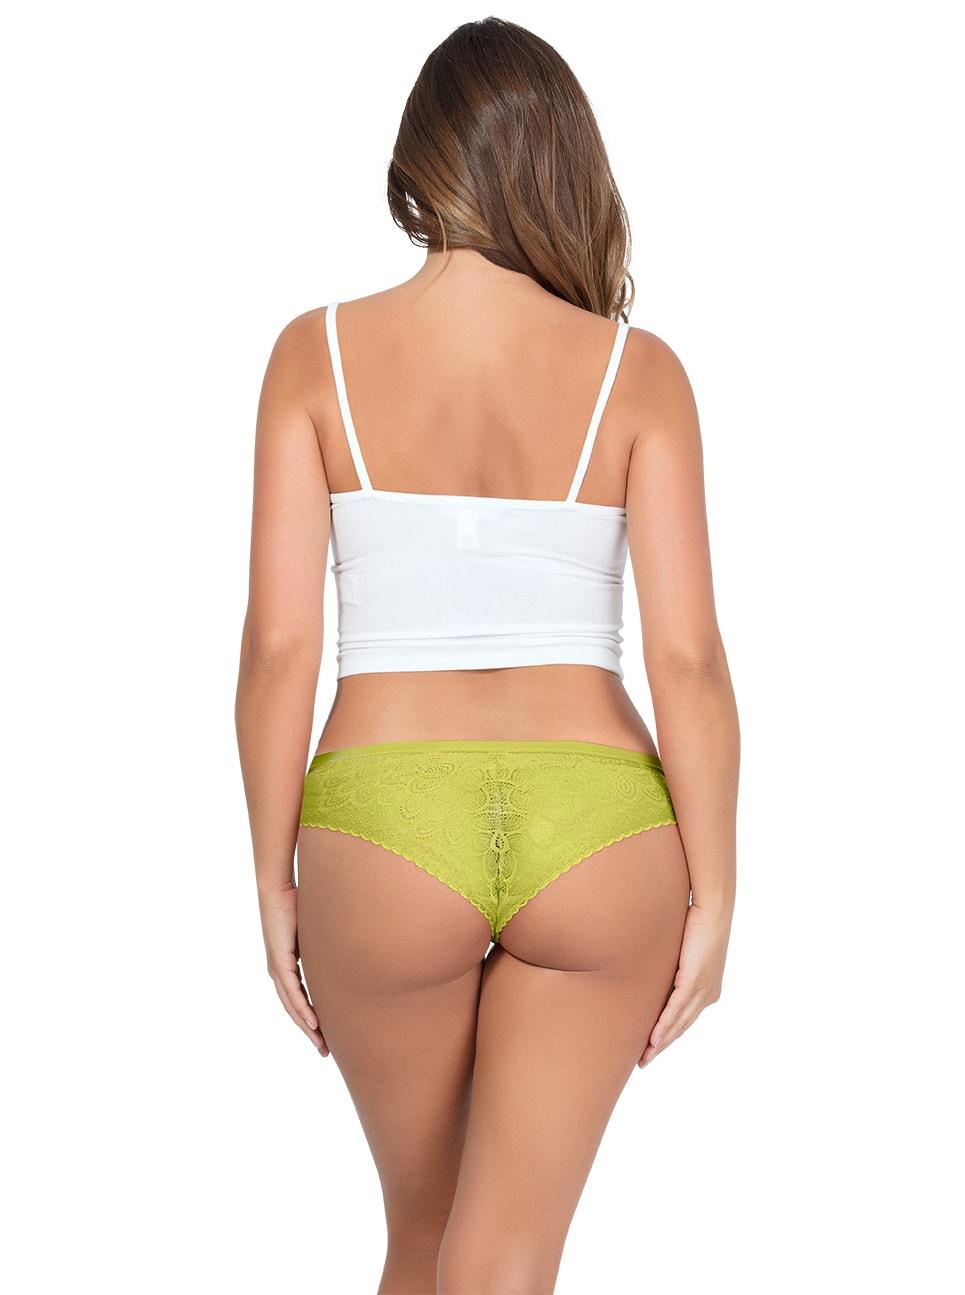 PARFAIT ParfaitPanty SoGlam BikiniPP302 Lemonade Back2 copy 2 - Parfait Panty So Glam Bikini - Lemonade - PP302